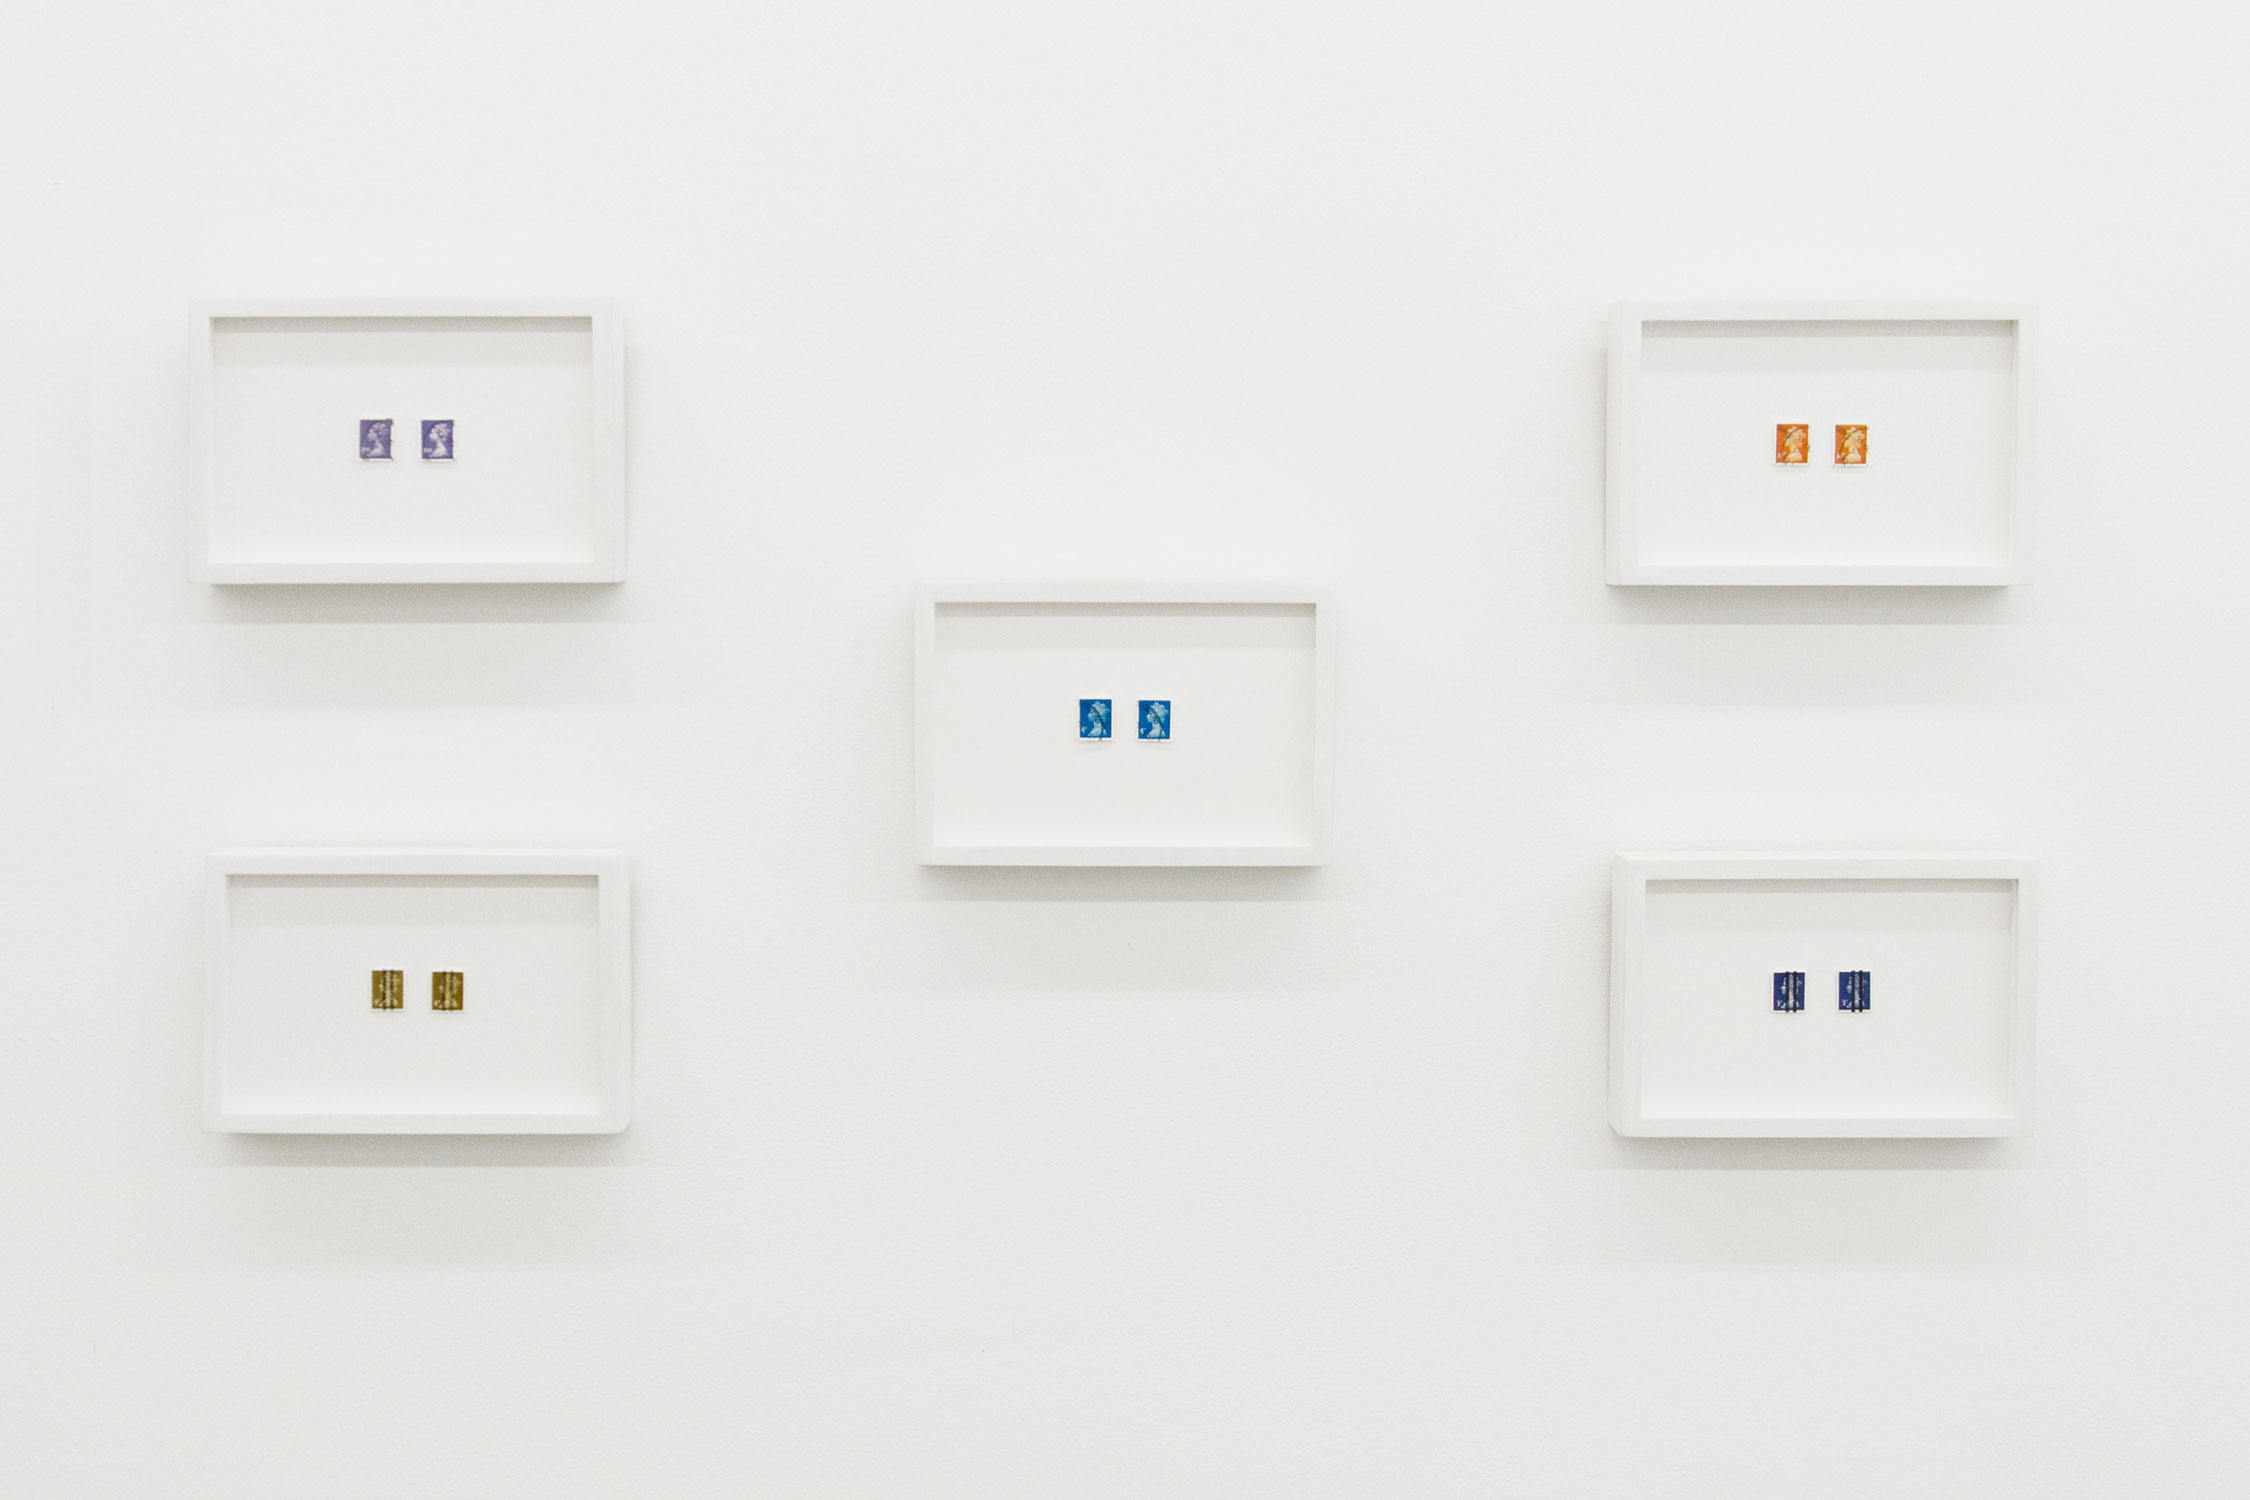 G Gallery, May 15 – June 13, 2015   Nadia Belerique, Mark Clintberg, Kristie MacDonald, Mungo Thomson   Curated by The Venn Diagram (Kristin Weckworth and Jon Davies)